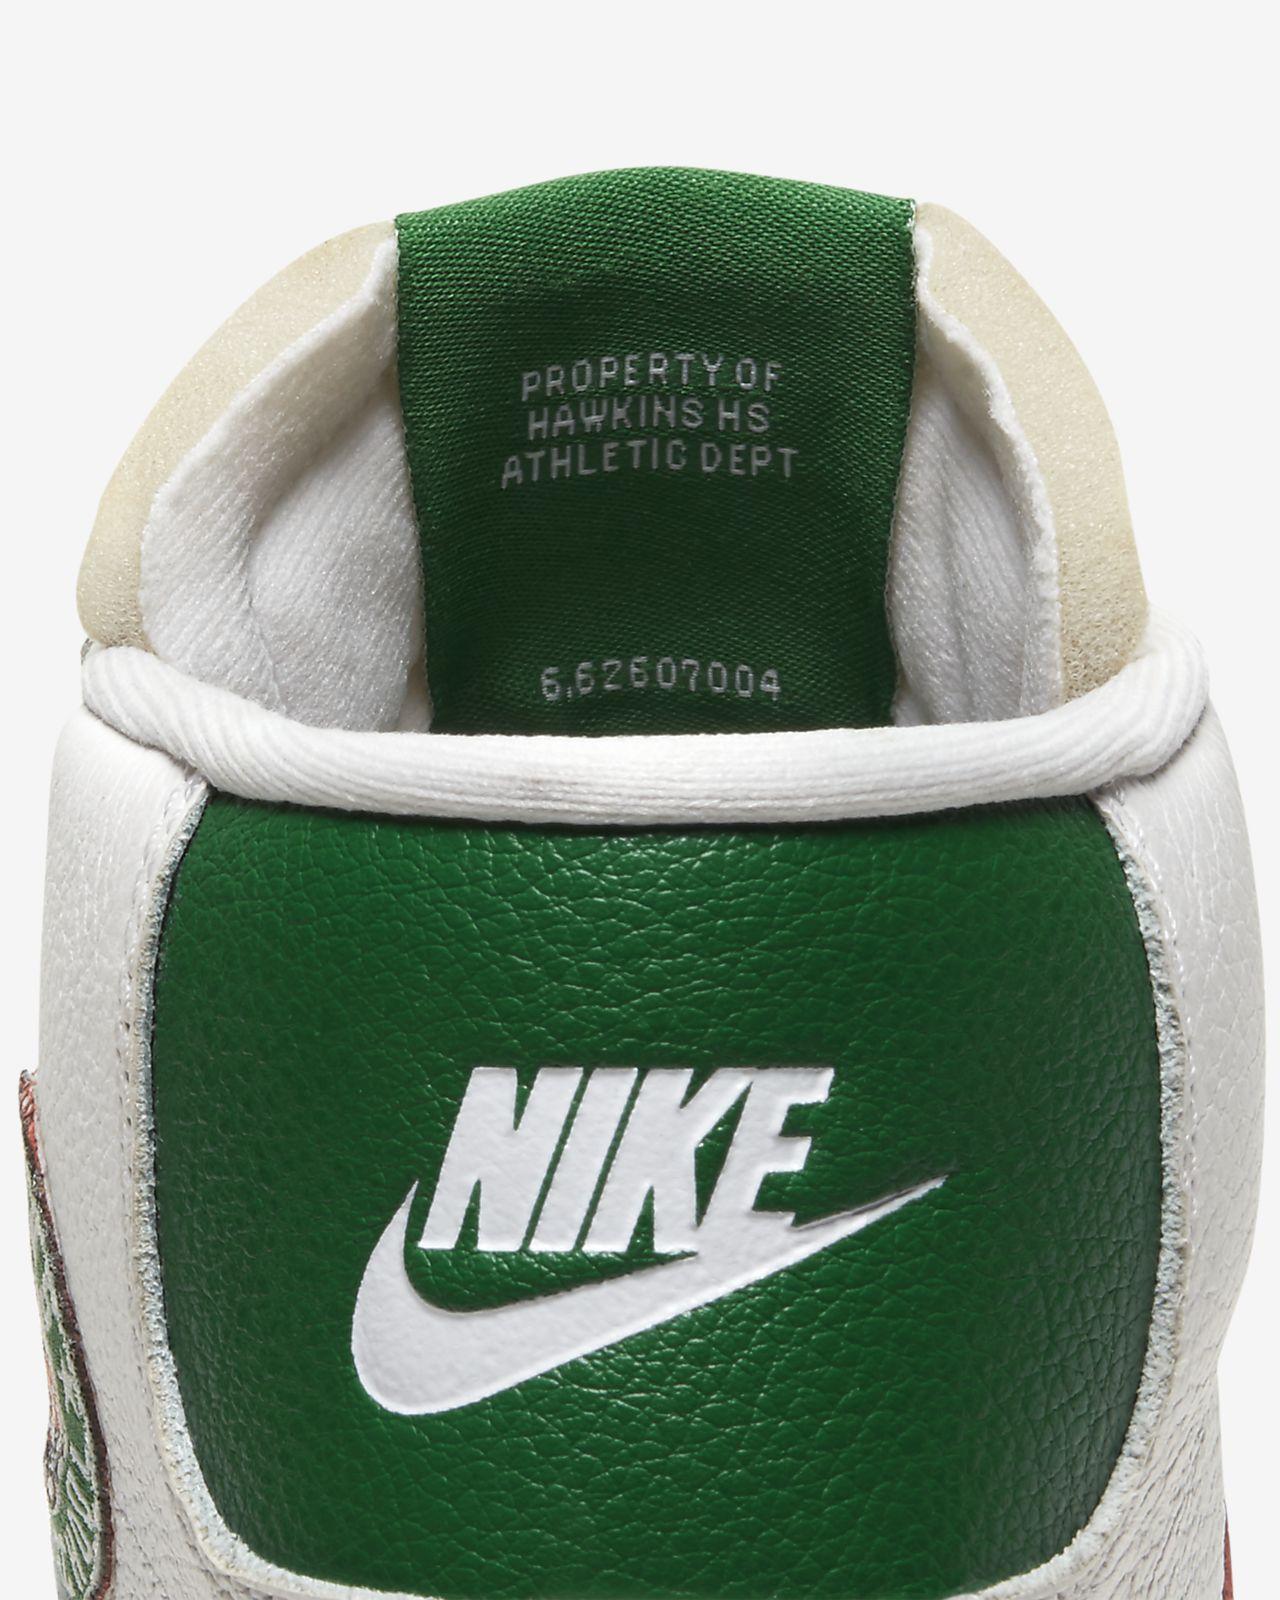 Sko Nike x Hawkins High Blazer Mid för män